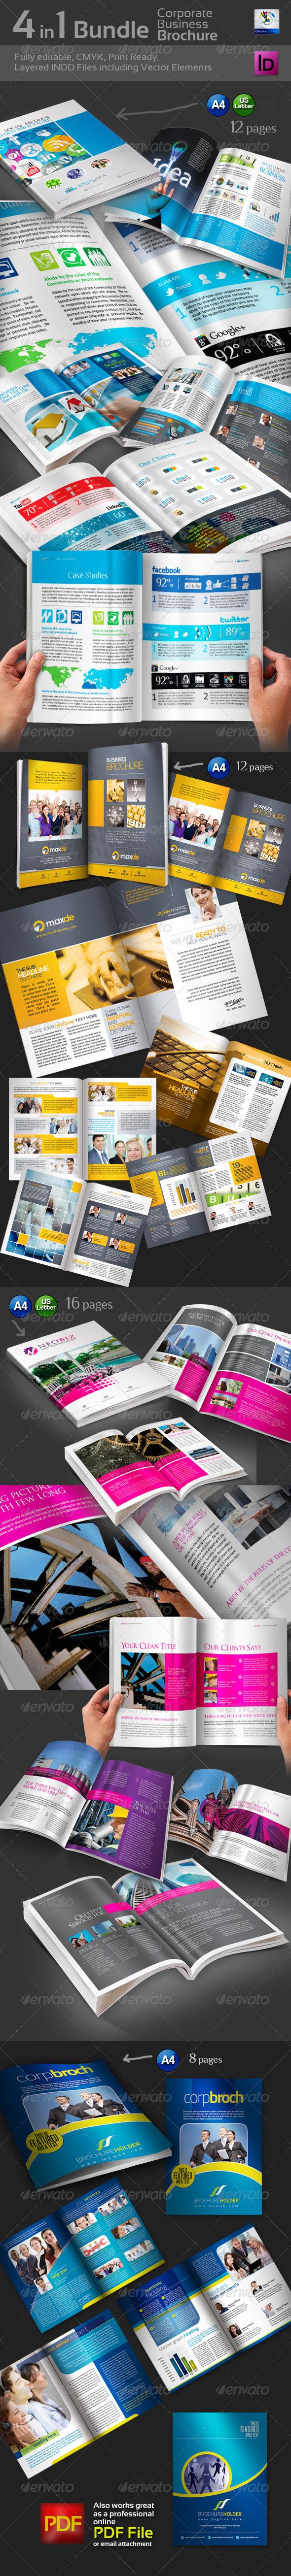 4 in 1 Bundle Bi-Fold Brochure - Corporate Brochures